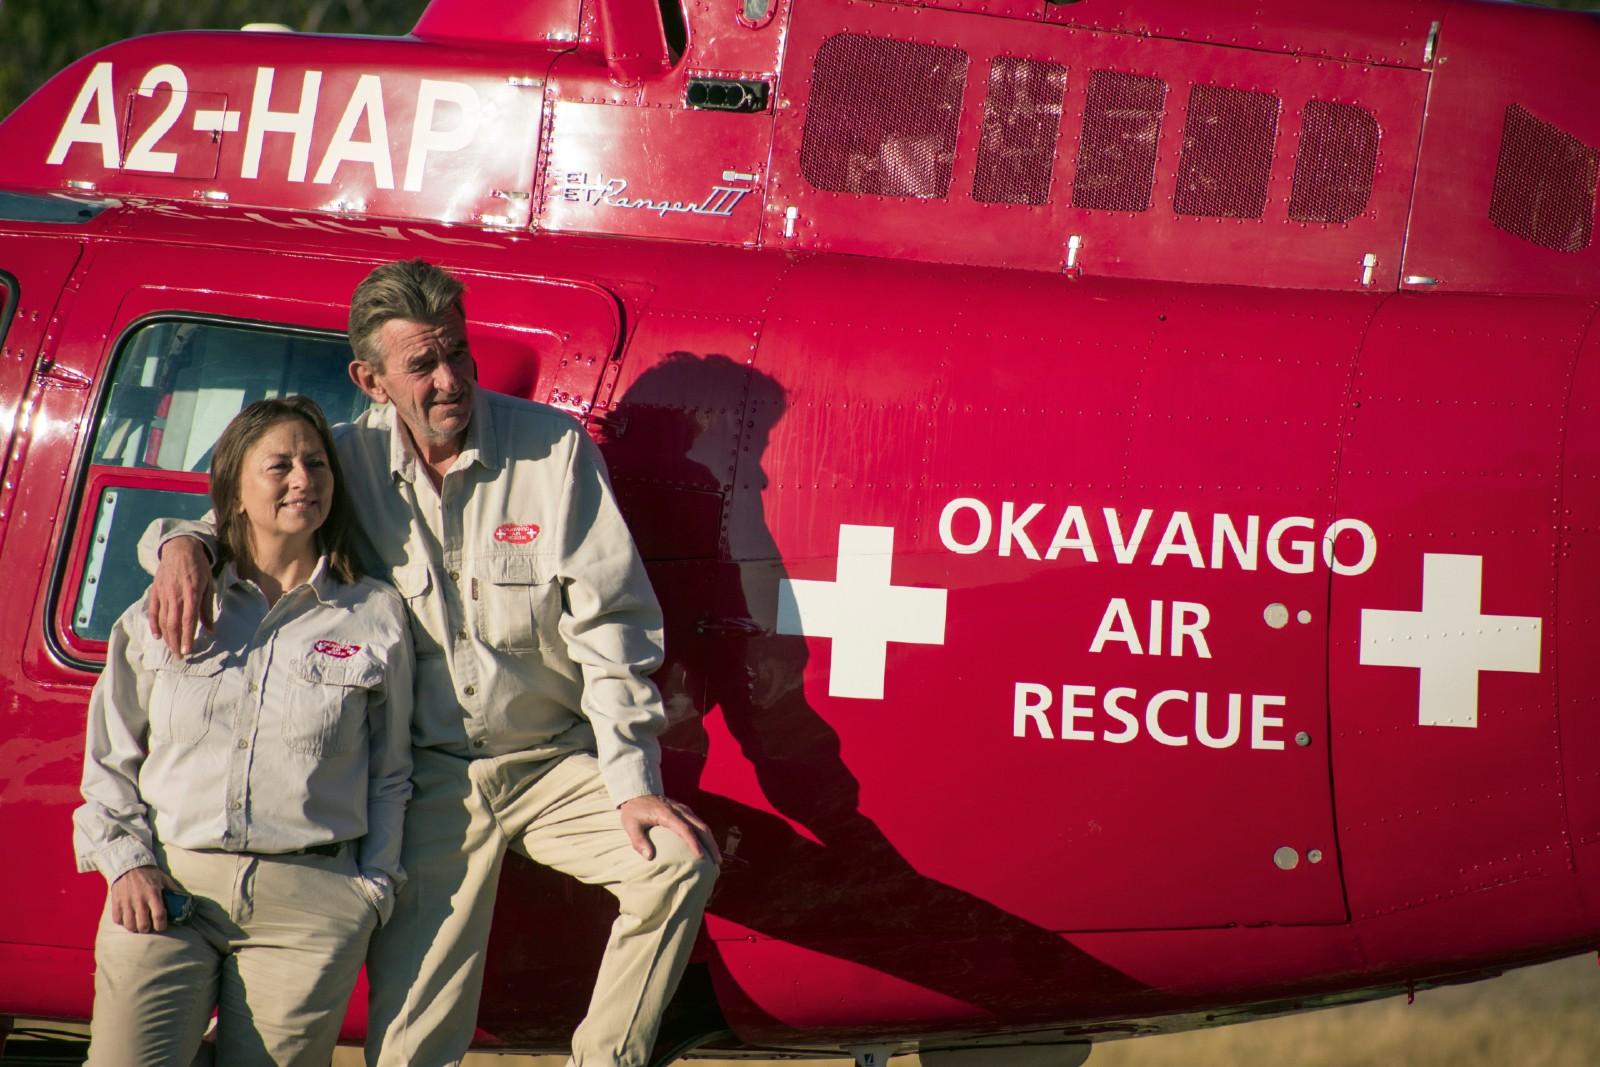 Okavango Air Rescue HighRes 13971